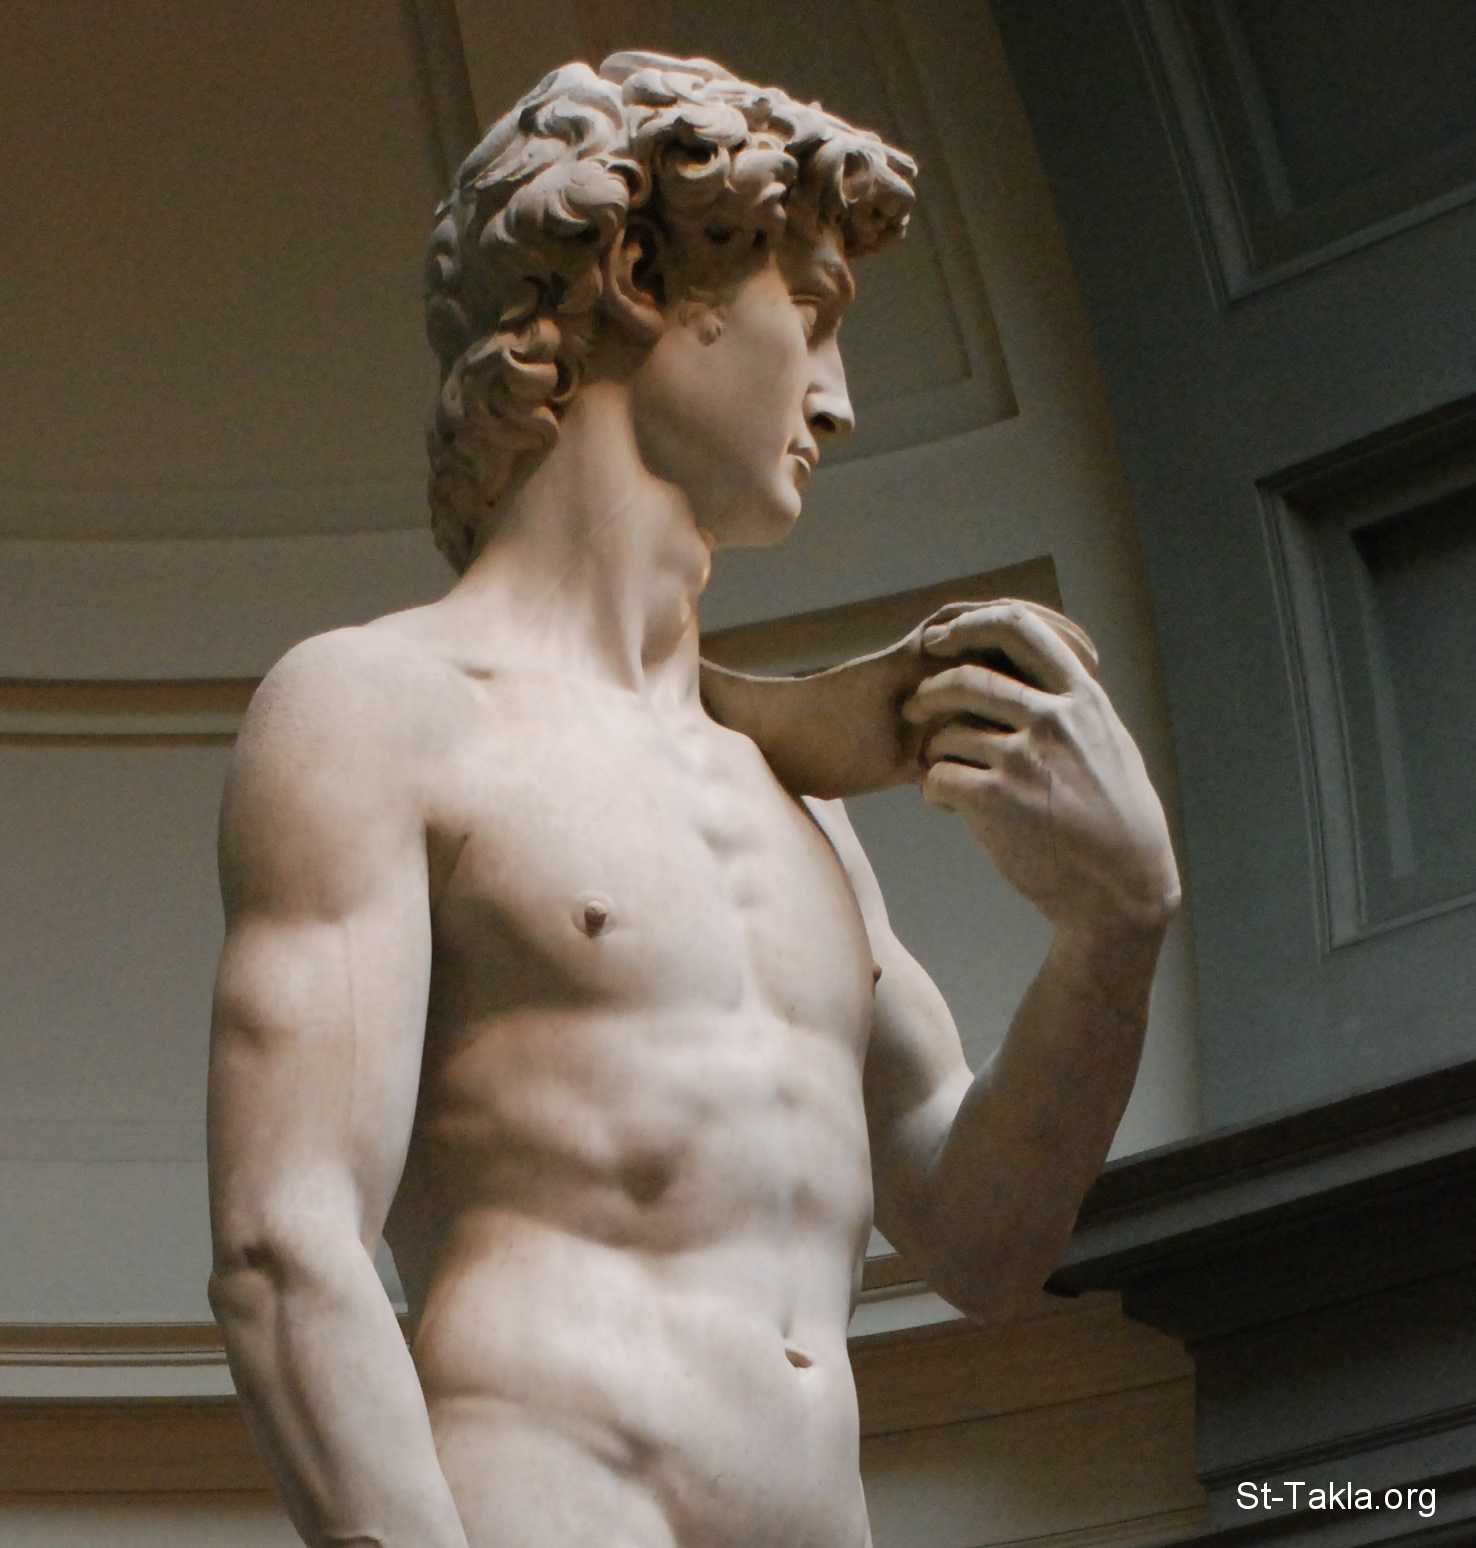 تمثال داوود لـ مايكل أنجلو